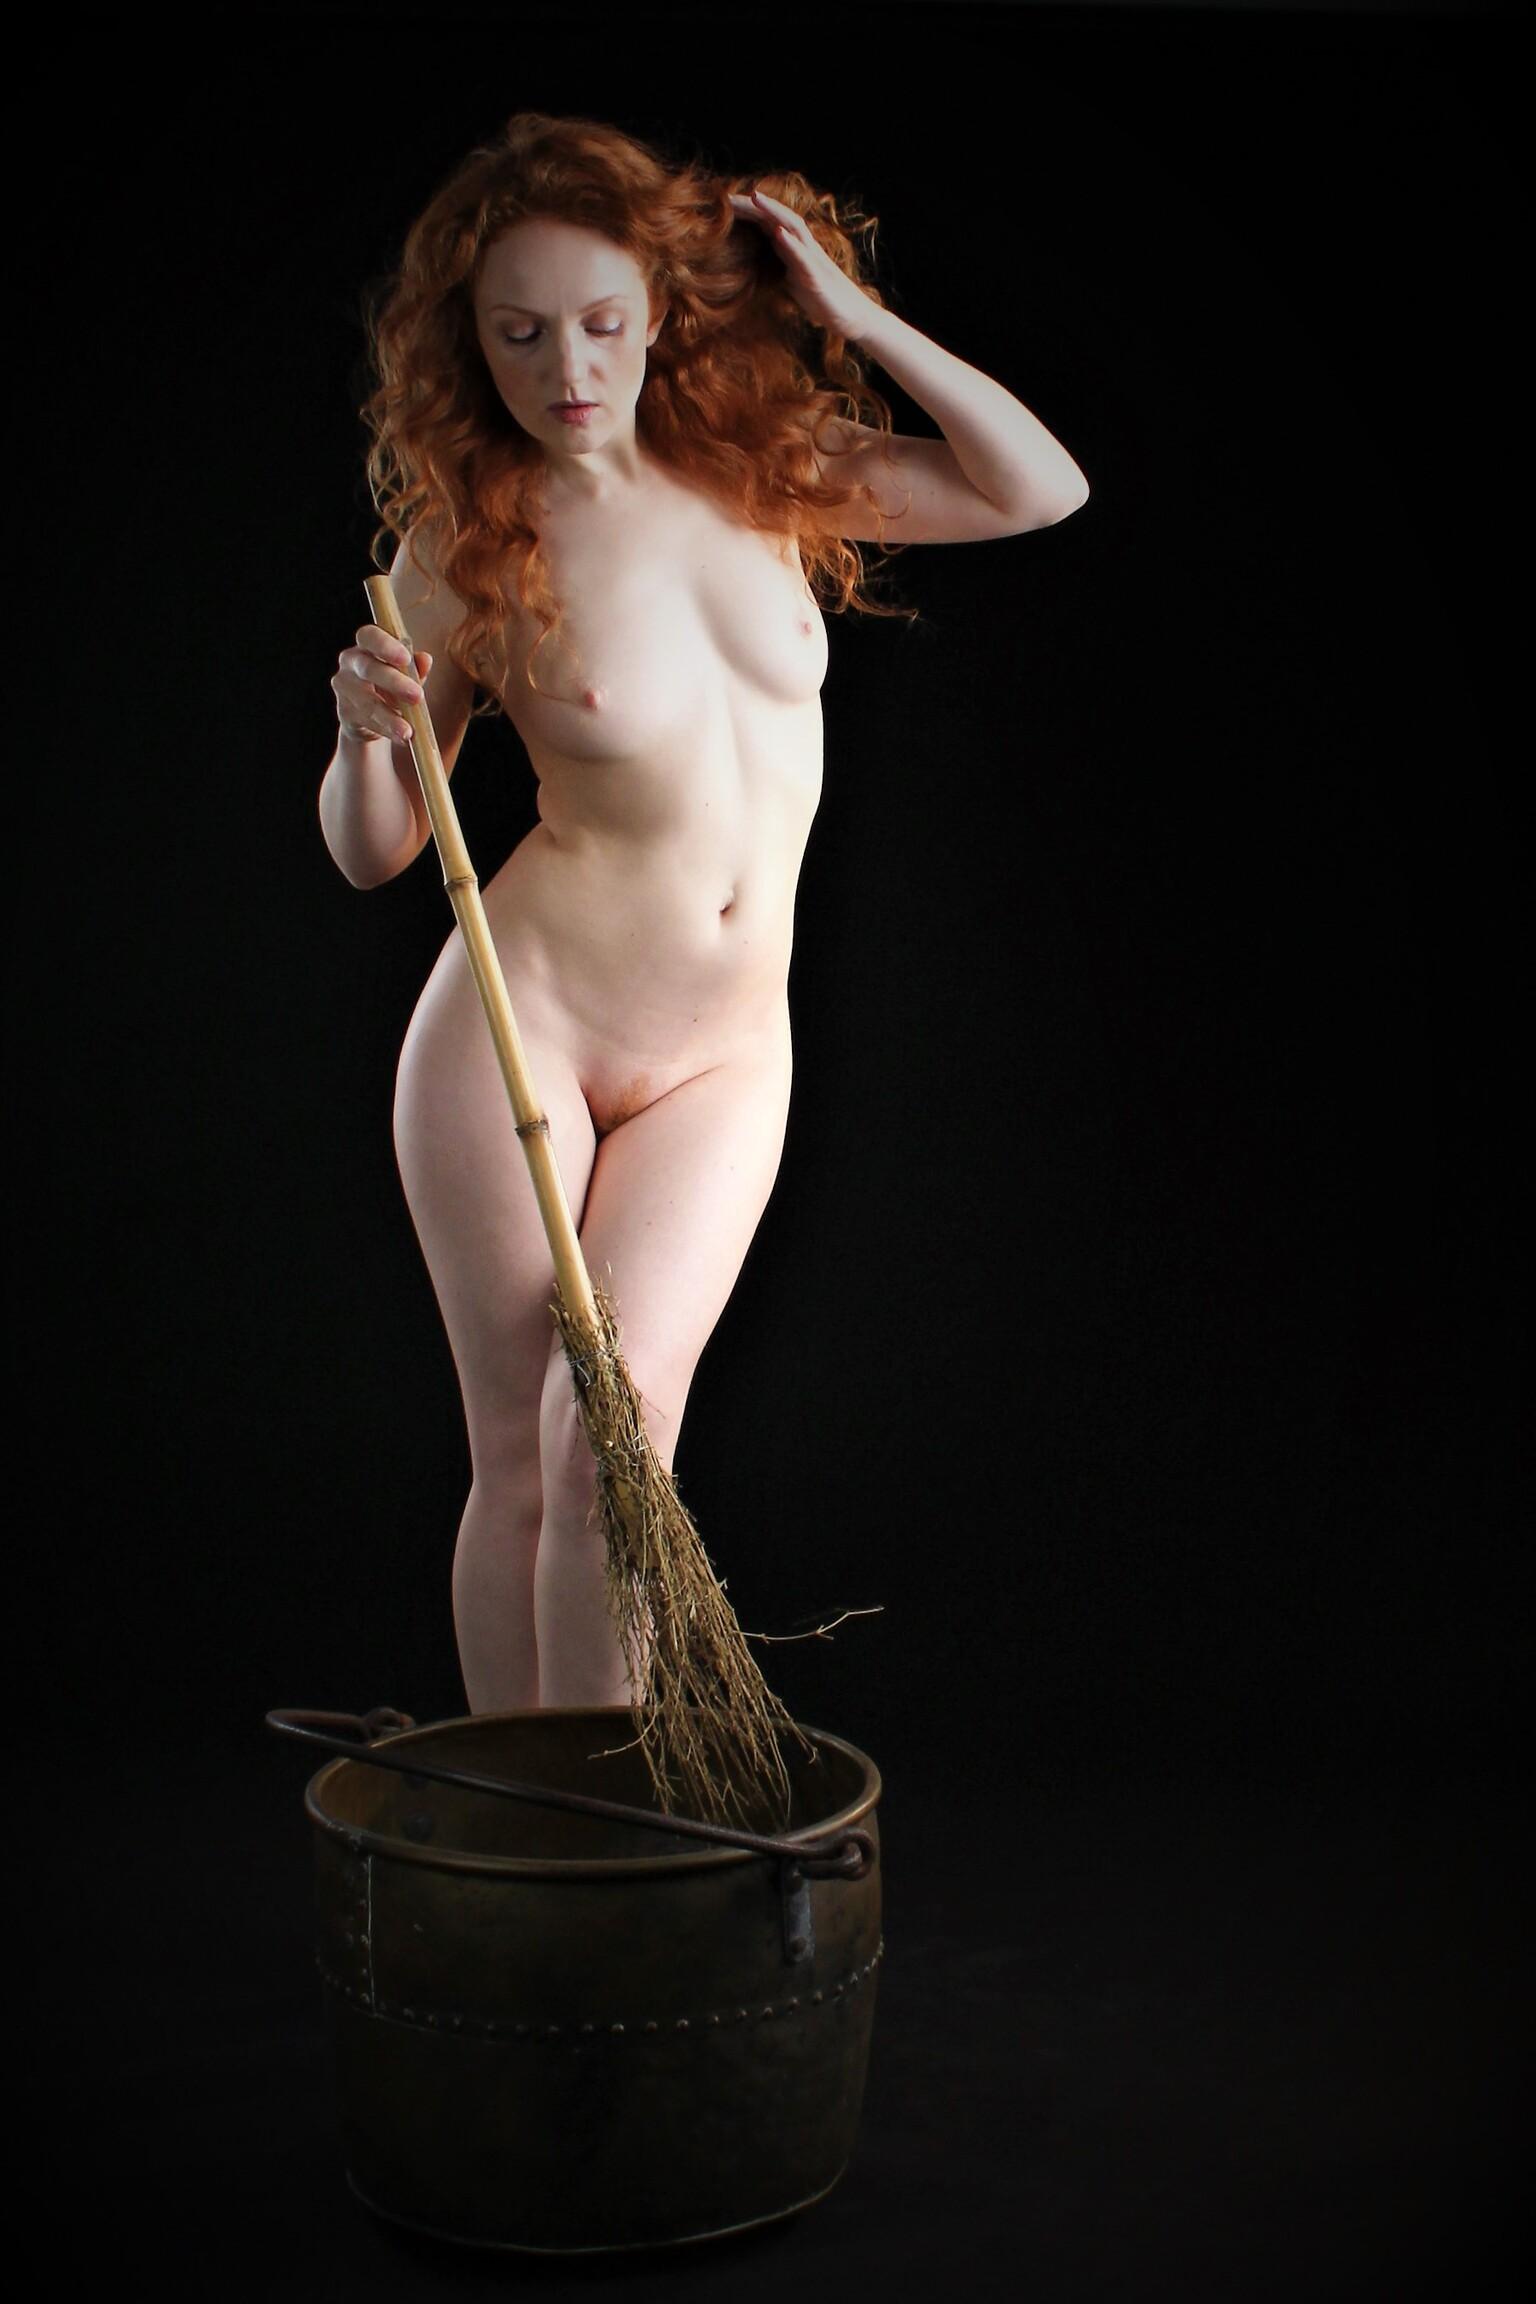 Like a witch - Model: Ivory Flame - foto door MathieuMagne op 09-04-2021 - deze foto bevat: naakt, heks, bezem, ketel, roodharige, studio, model, flitsfotografie, gebaar, dij, borst, kofferbak, elleboog, kunstmodel, taille, knie, buik